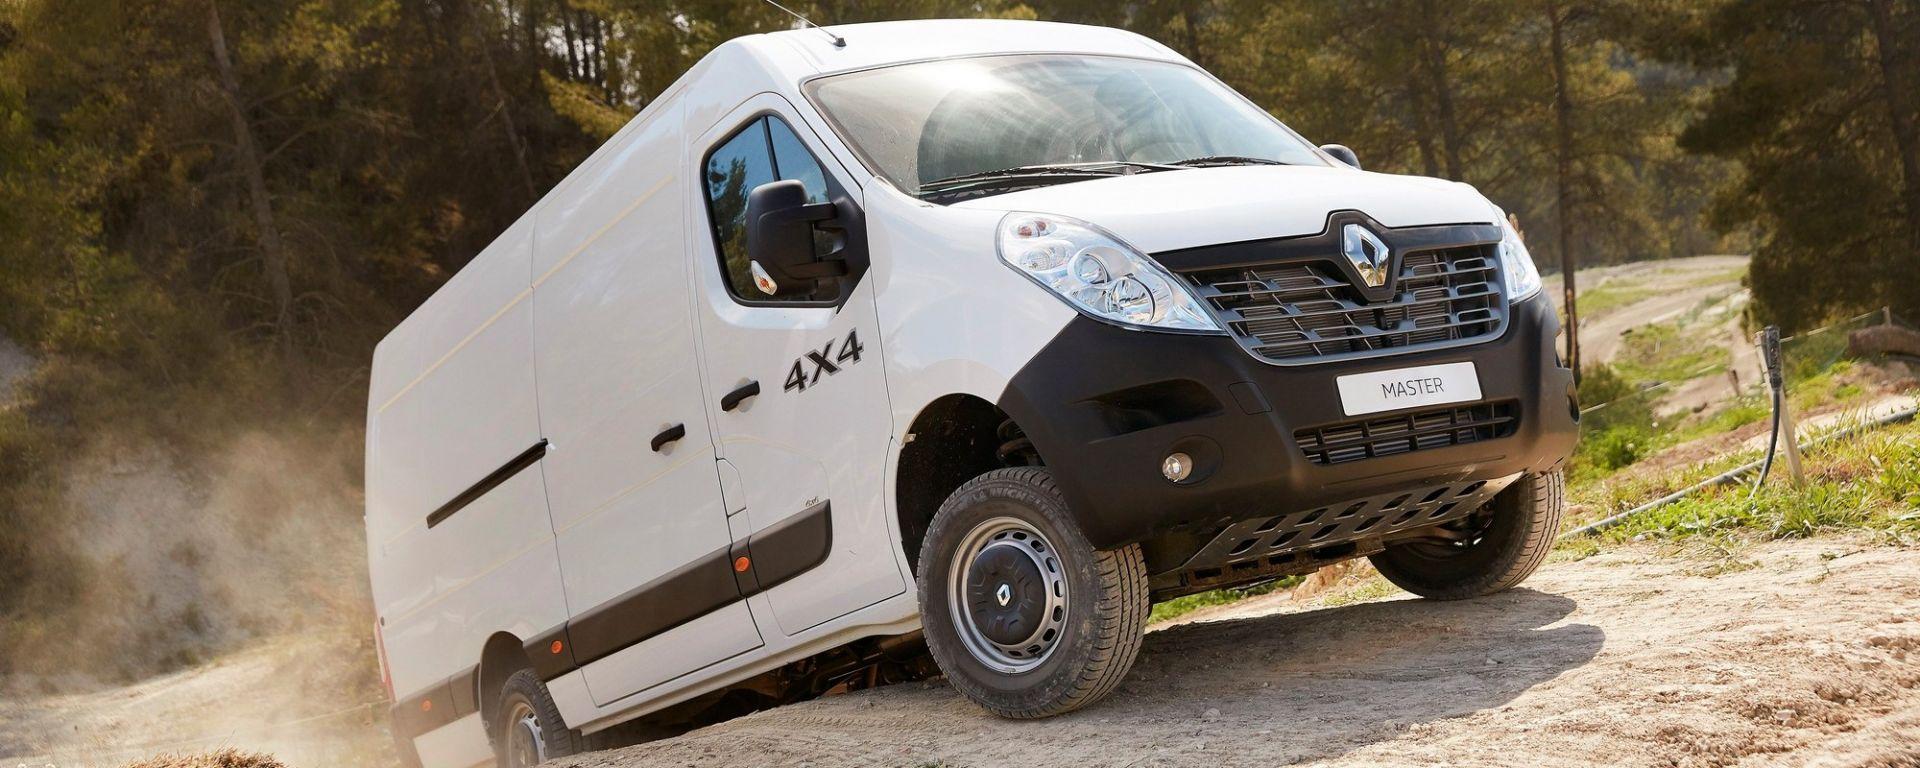 Renault Business Booster Tour: Kangoo, Trafic e Master arrivano con l' X-Track